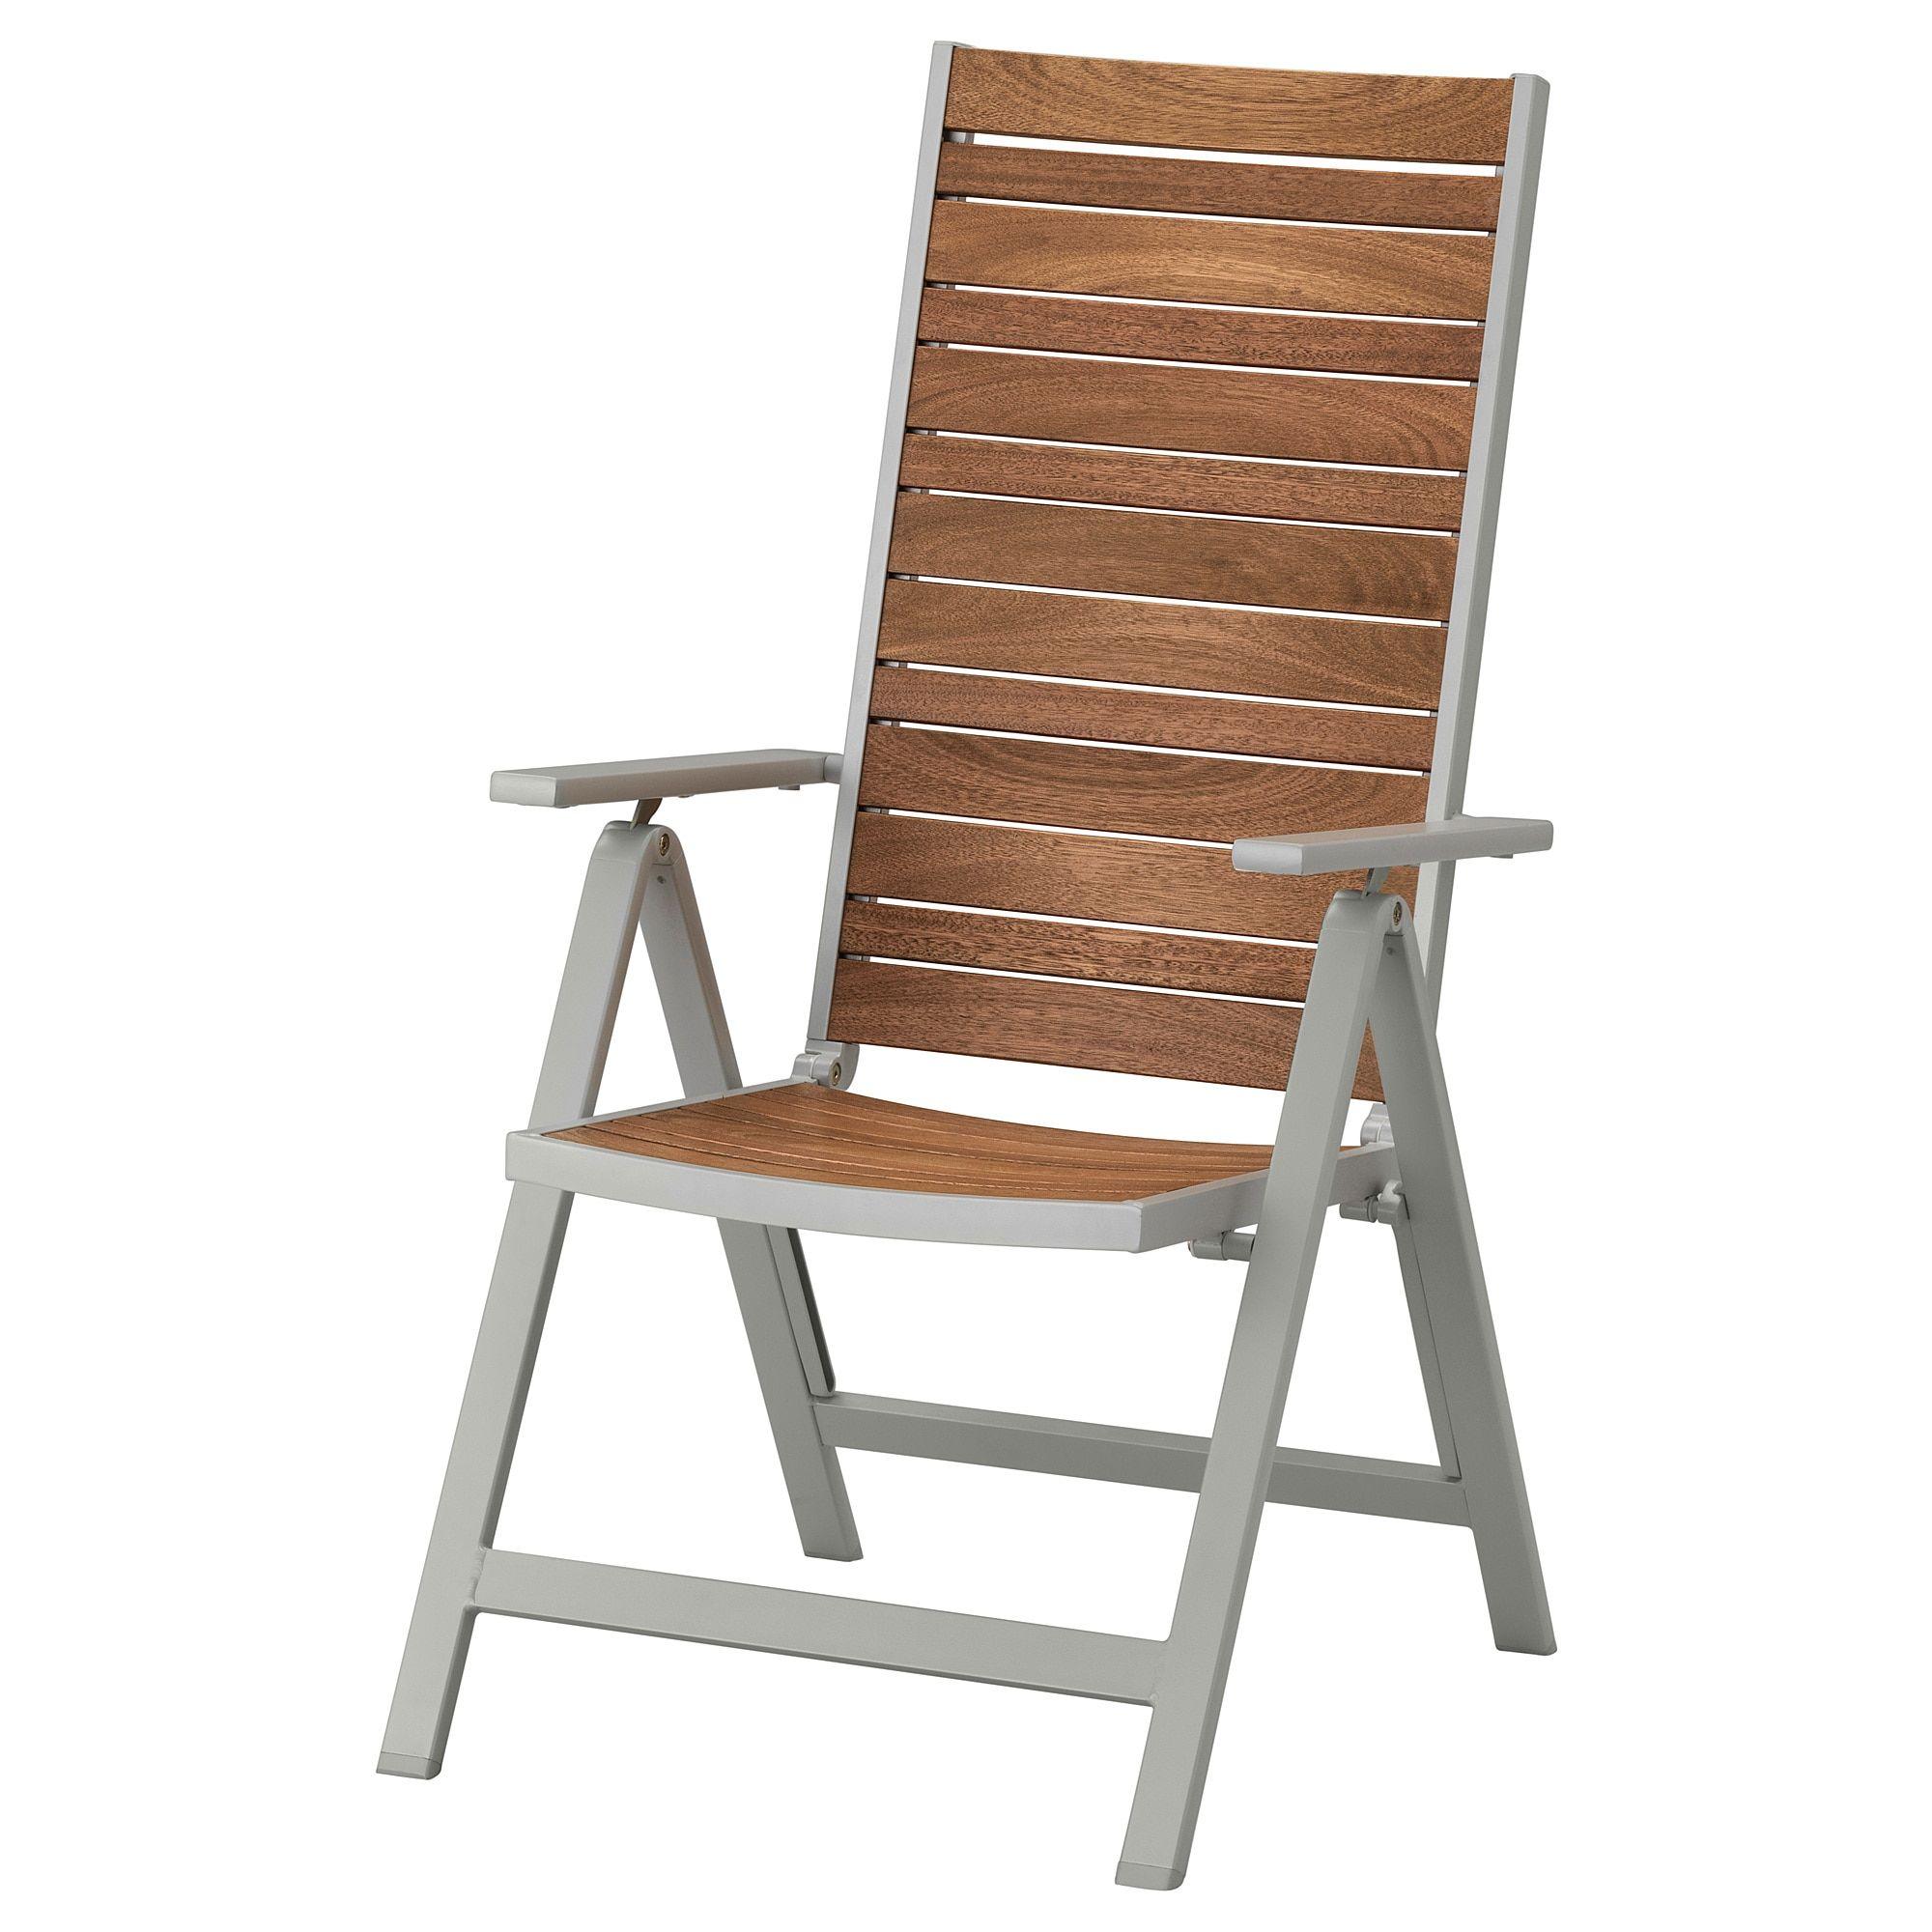 Excellent Ikea Sjalland Light Gray Foldable Light Brown Reclining Creativecarmelina Interior Chair Design Creativecarmelinacom